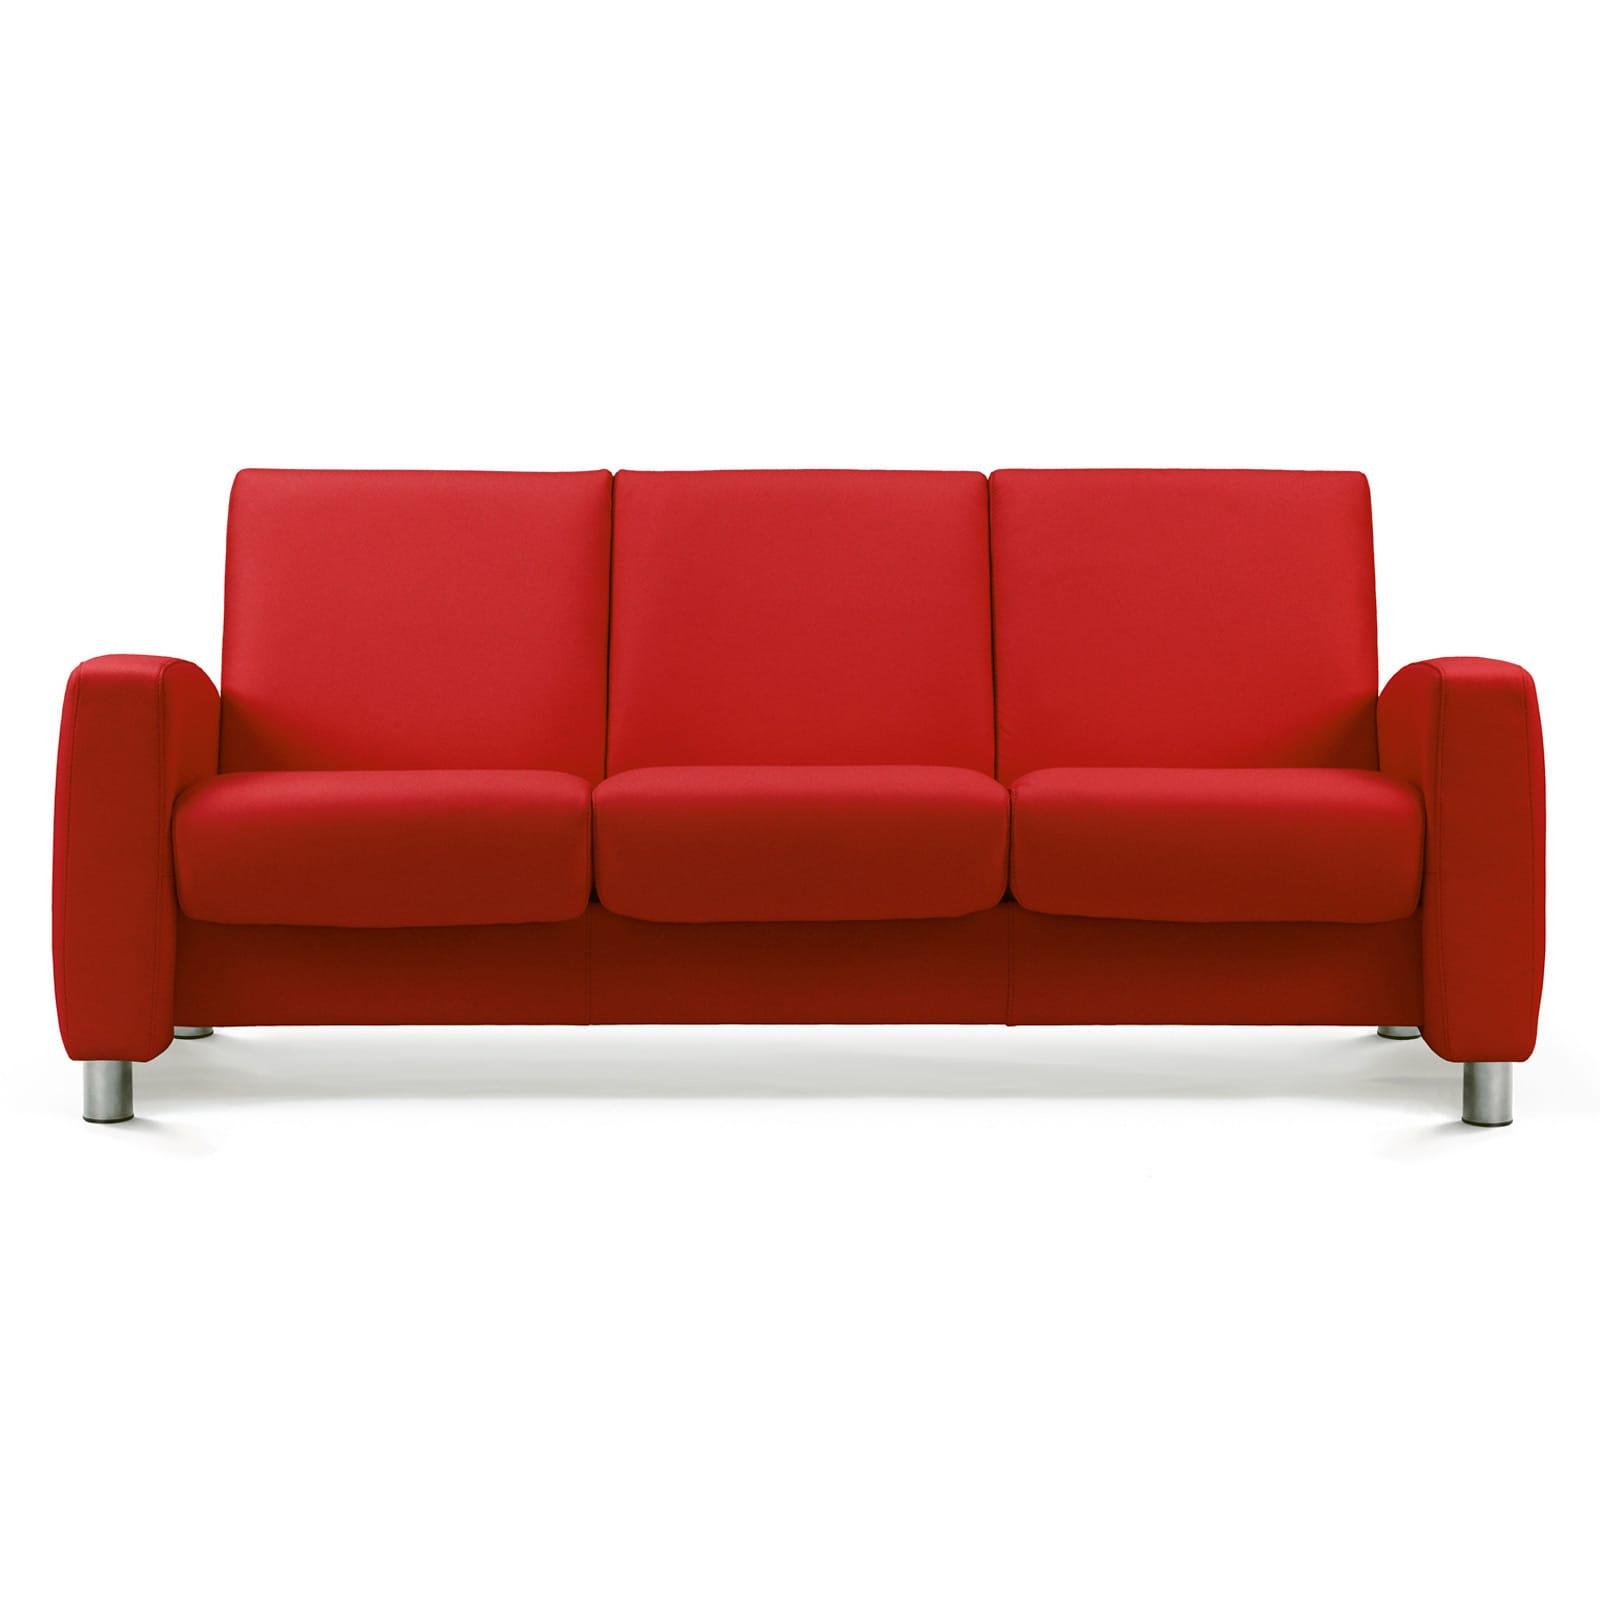 stressless 3 sitzer ekornes coffee table elegant stressless sofa joy 3 sitzer stressless